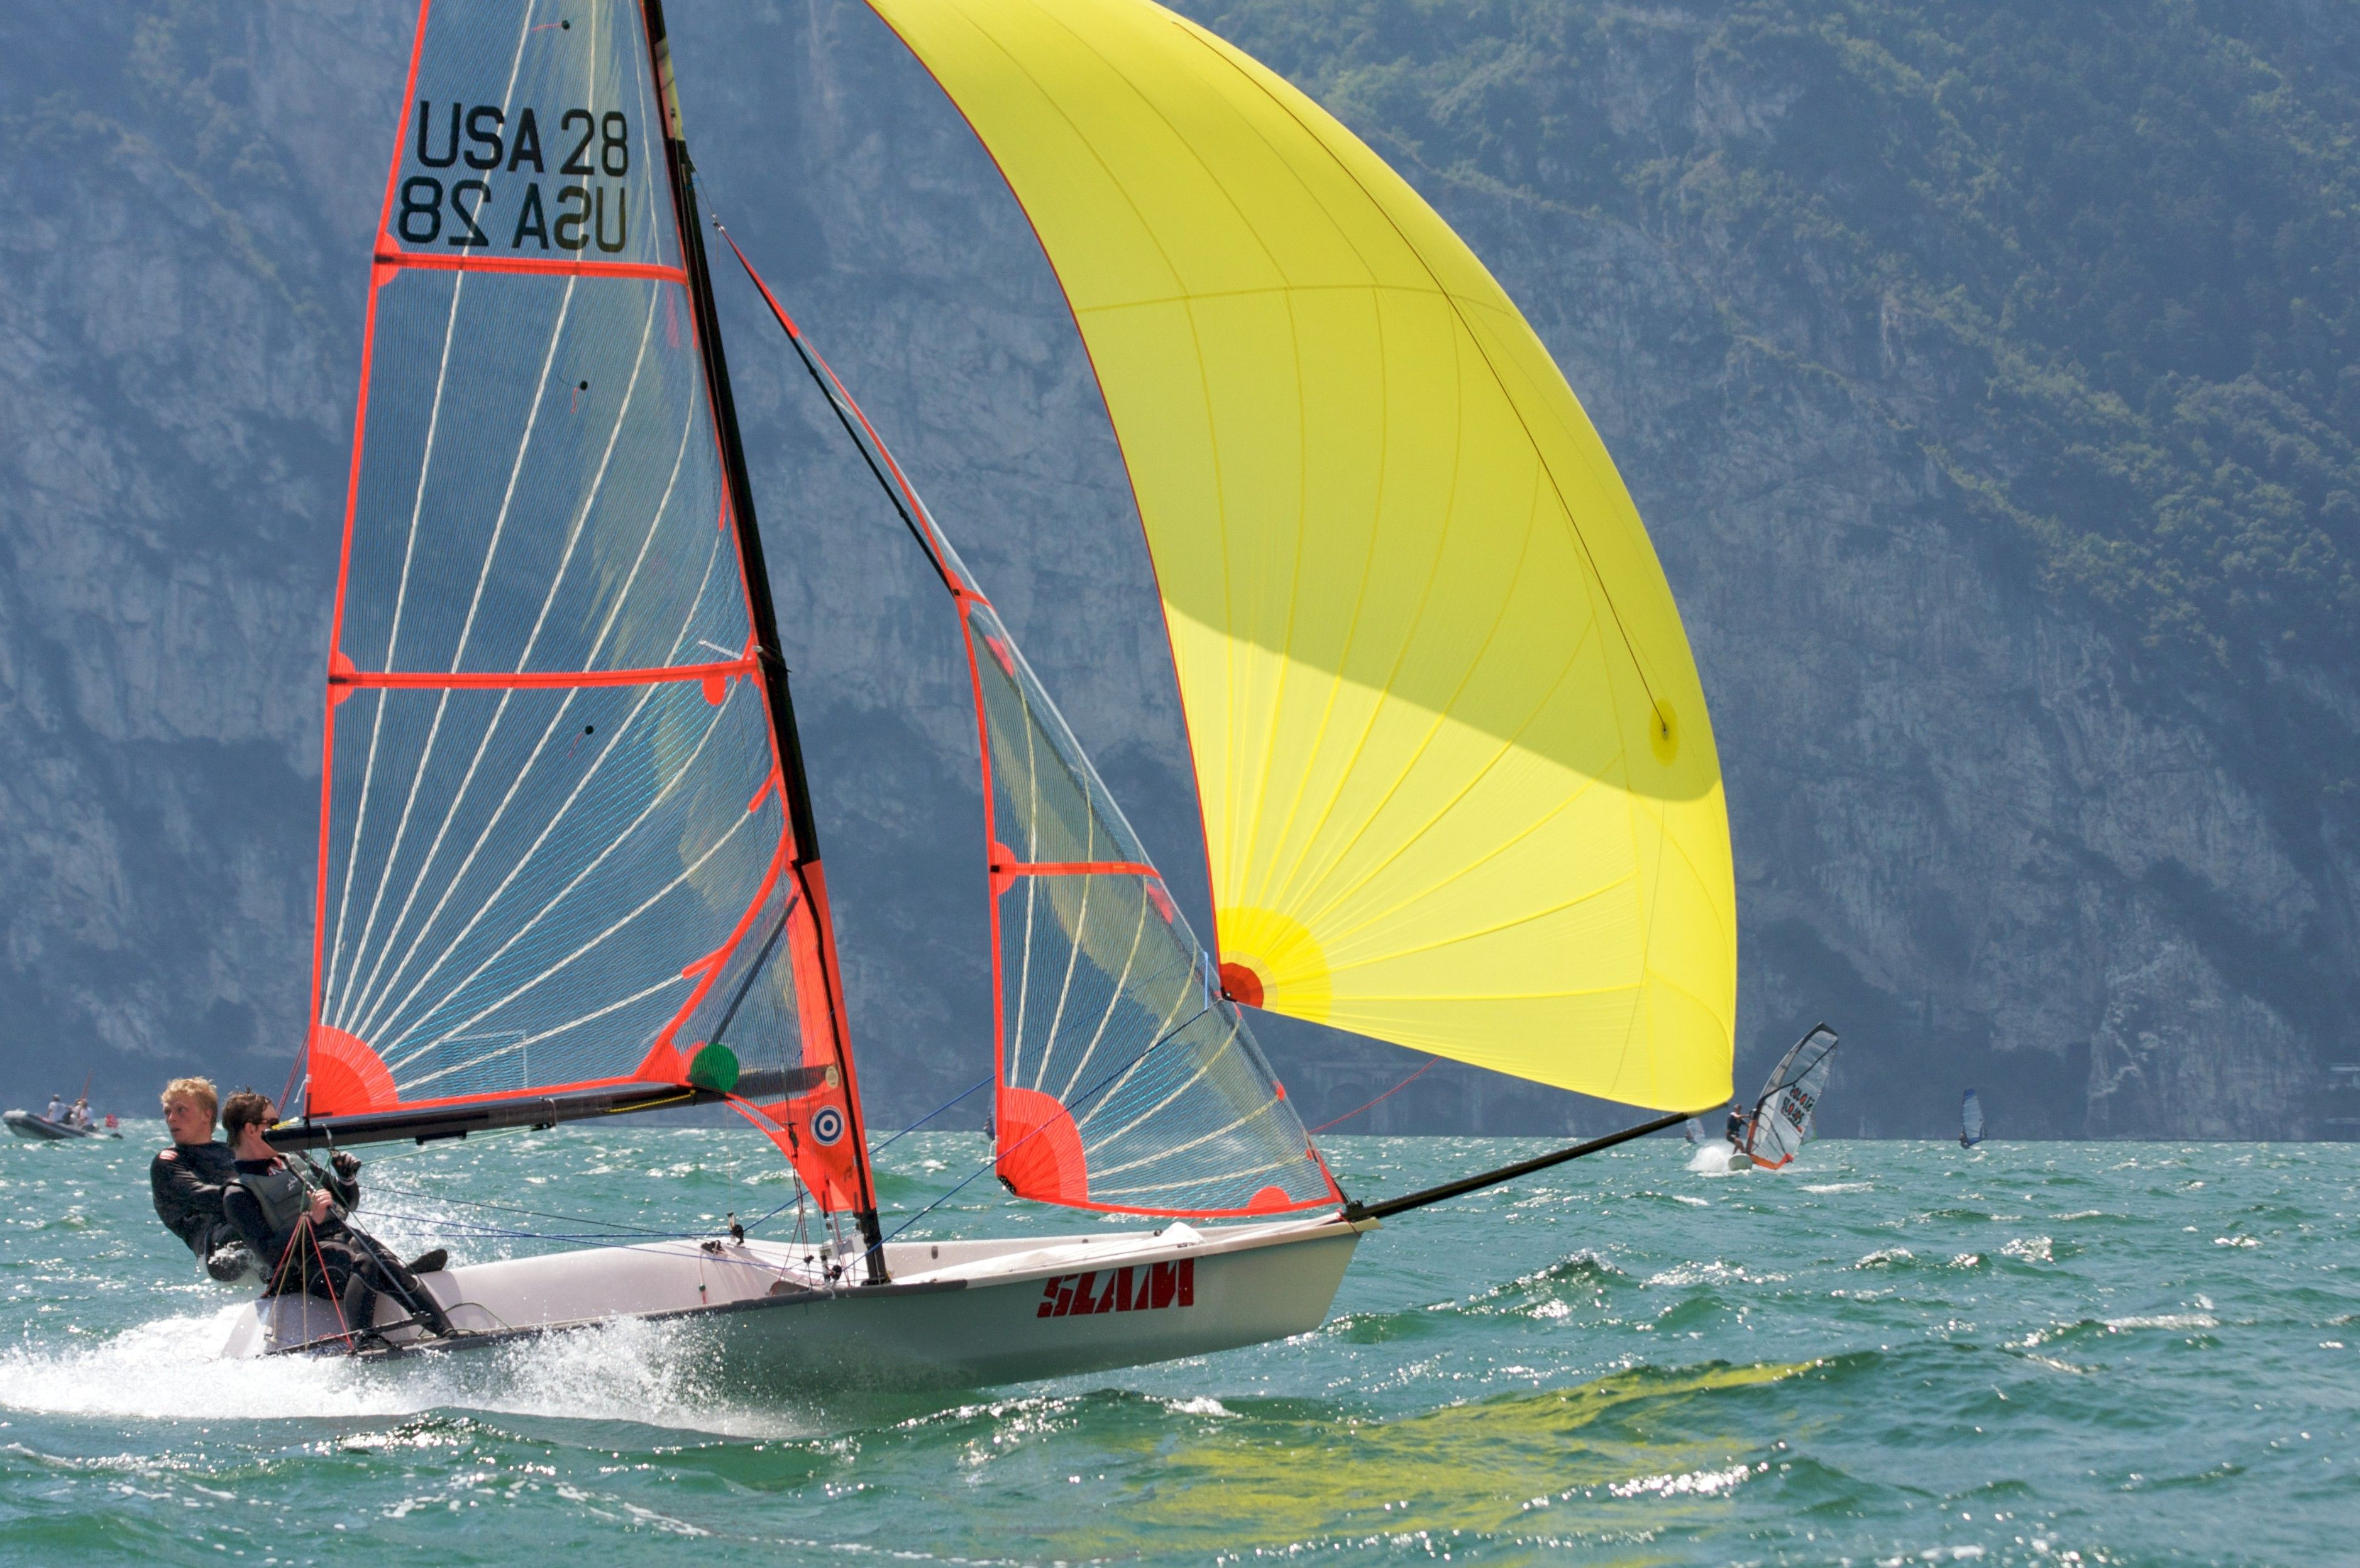 49er dinghy Google Search Boat, Sailing, Sailboat